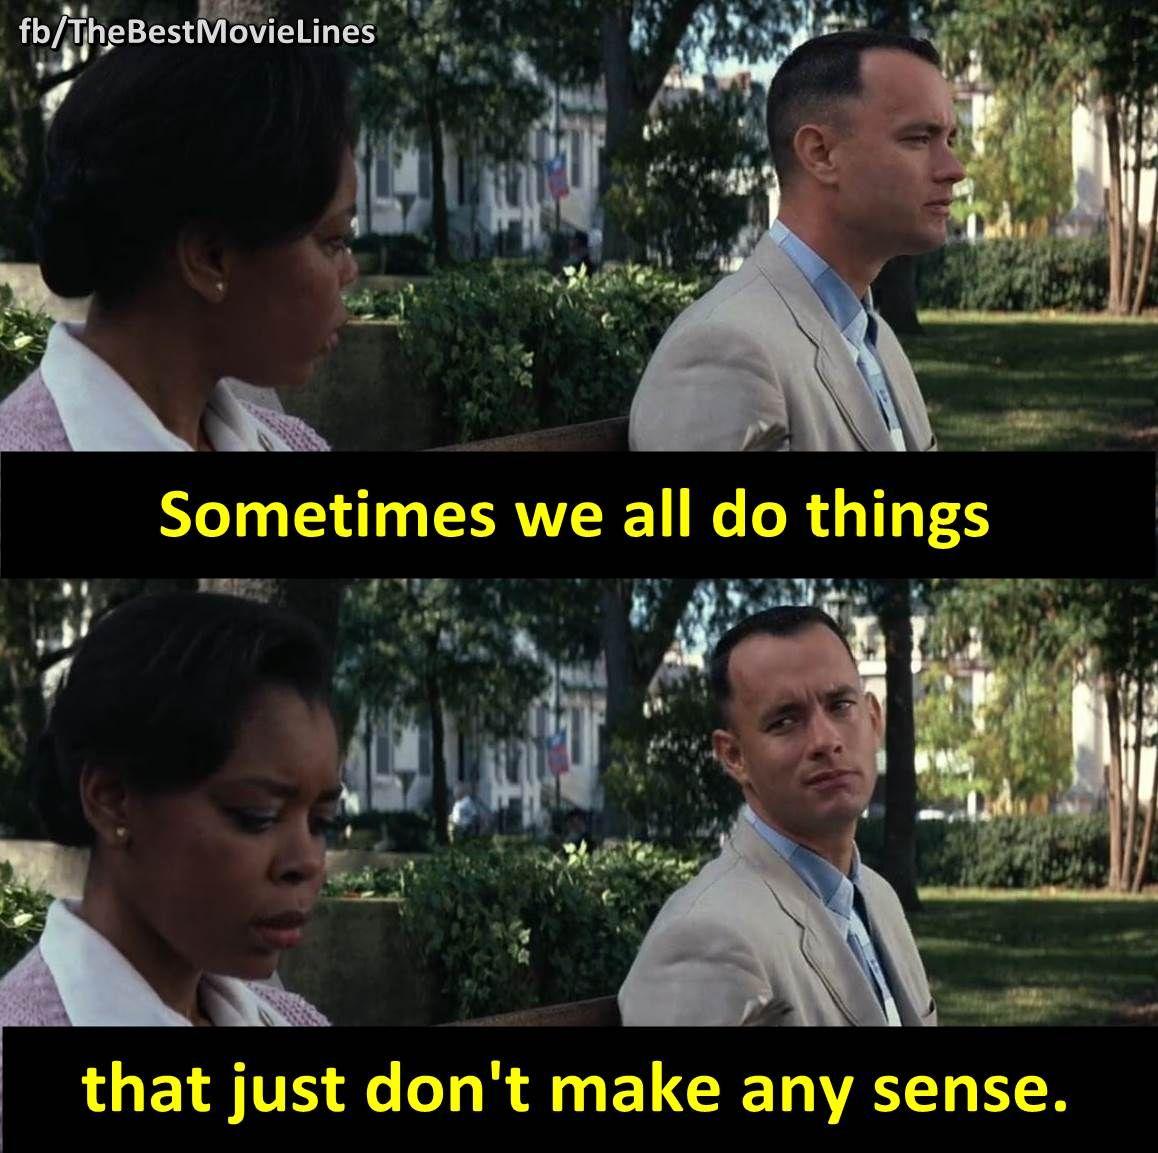 Famous Tom Hanks Movie Quotes: - Tom Hanks In Forrest Gump 1994